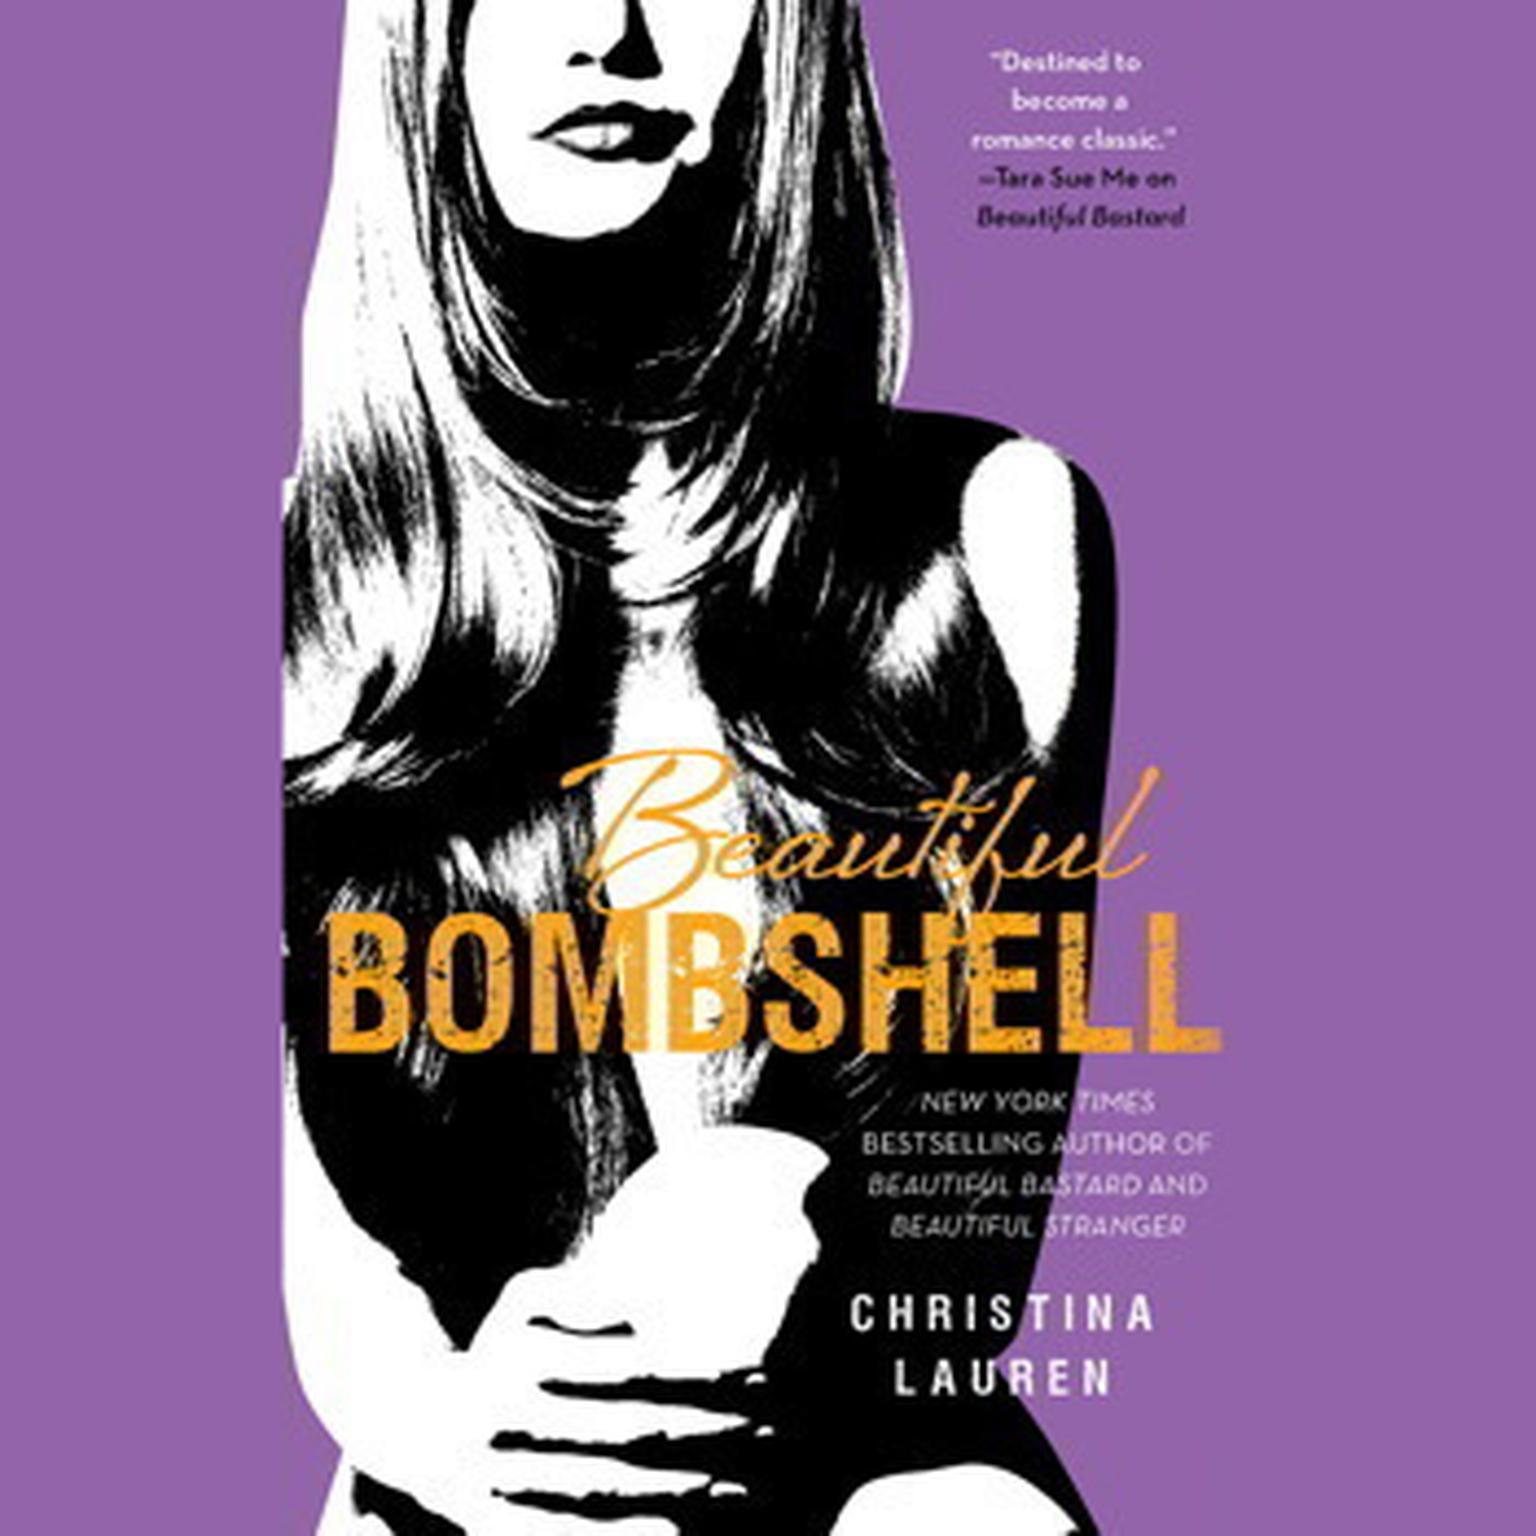 Beautiful Bombshell Audiobook, by Christina Lauren